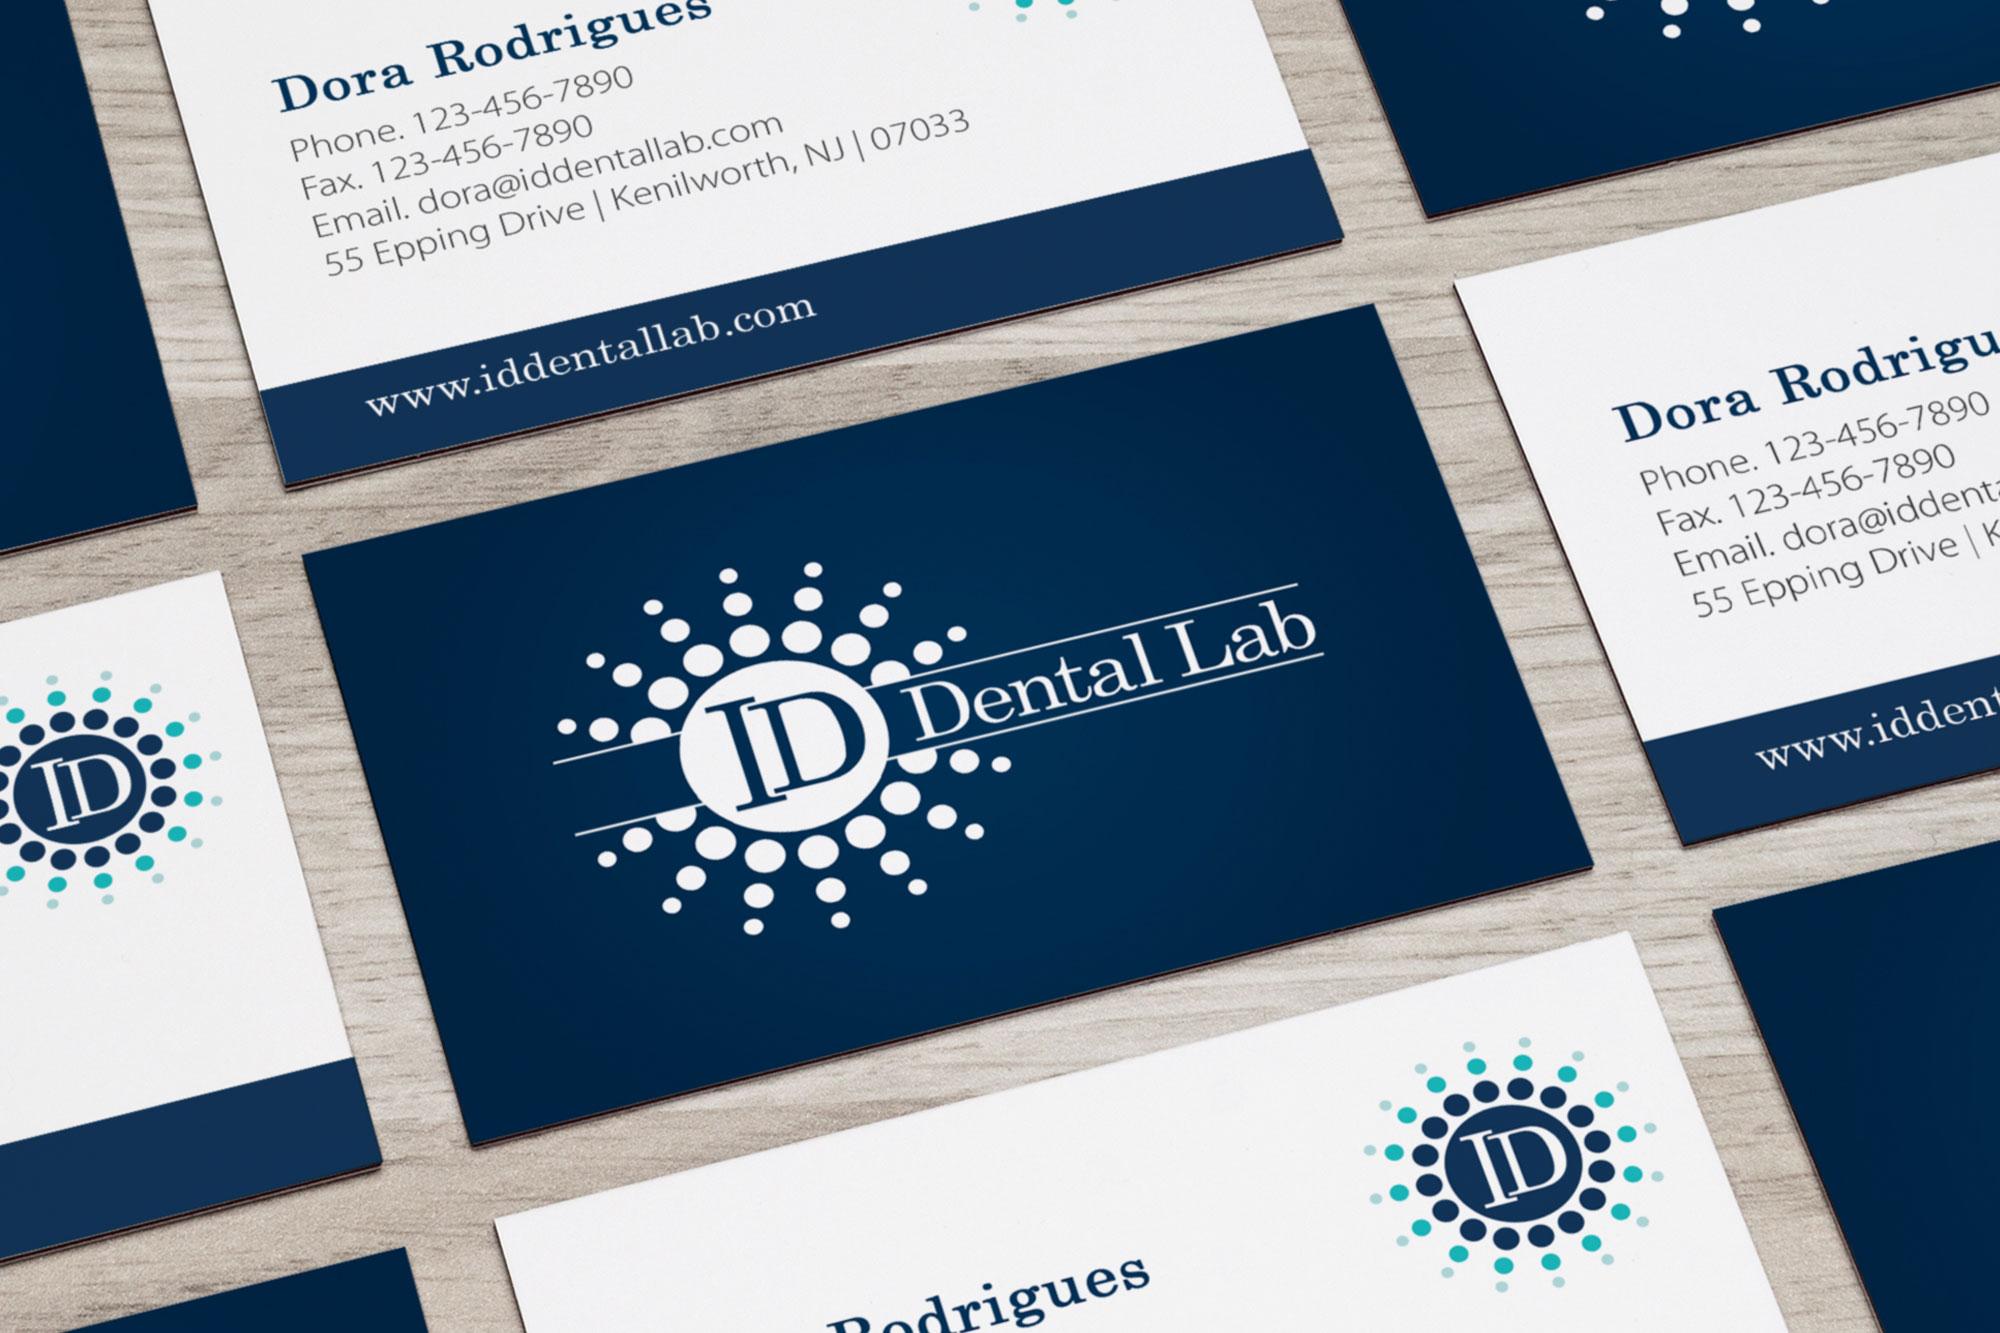 ID Dental Laboratory Business Cards